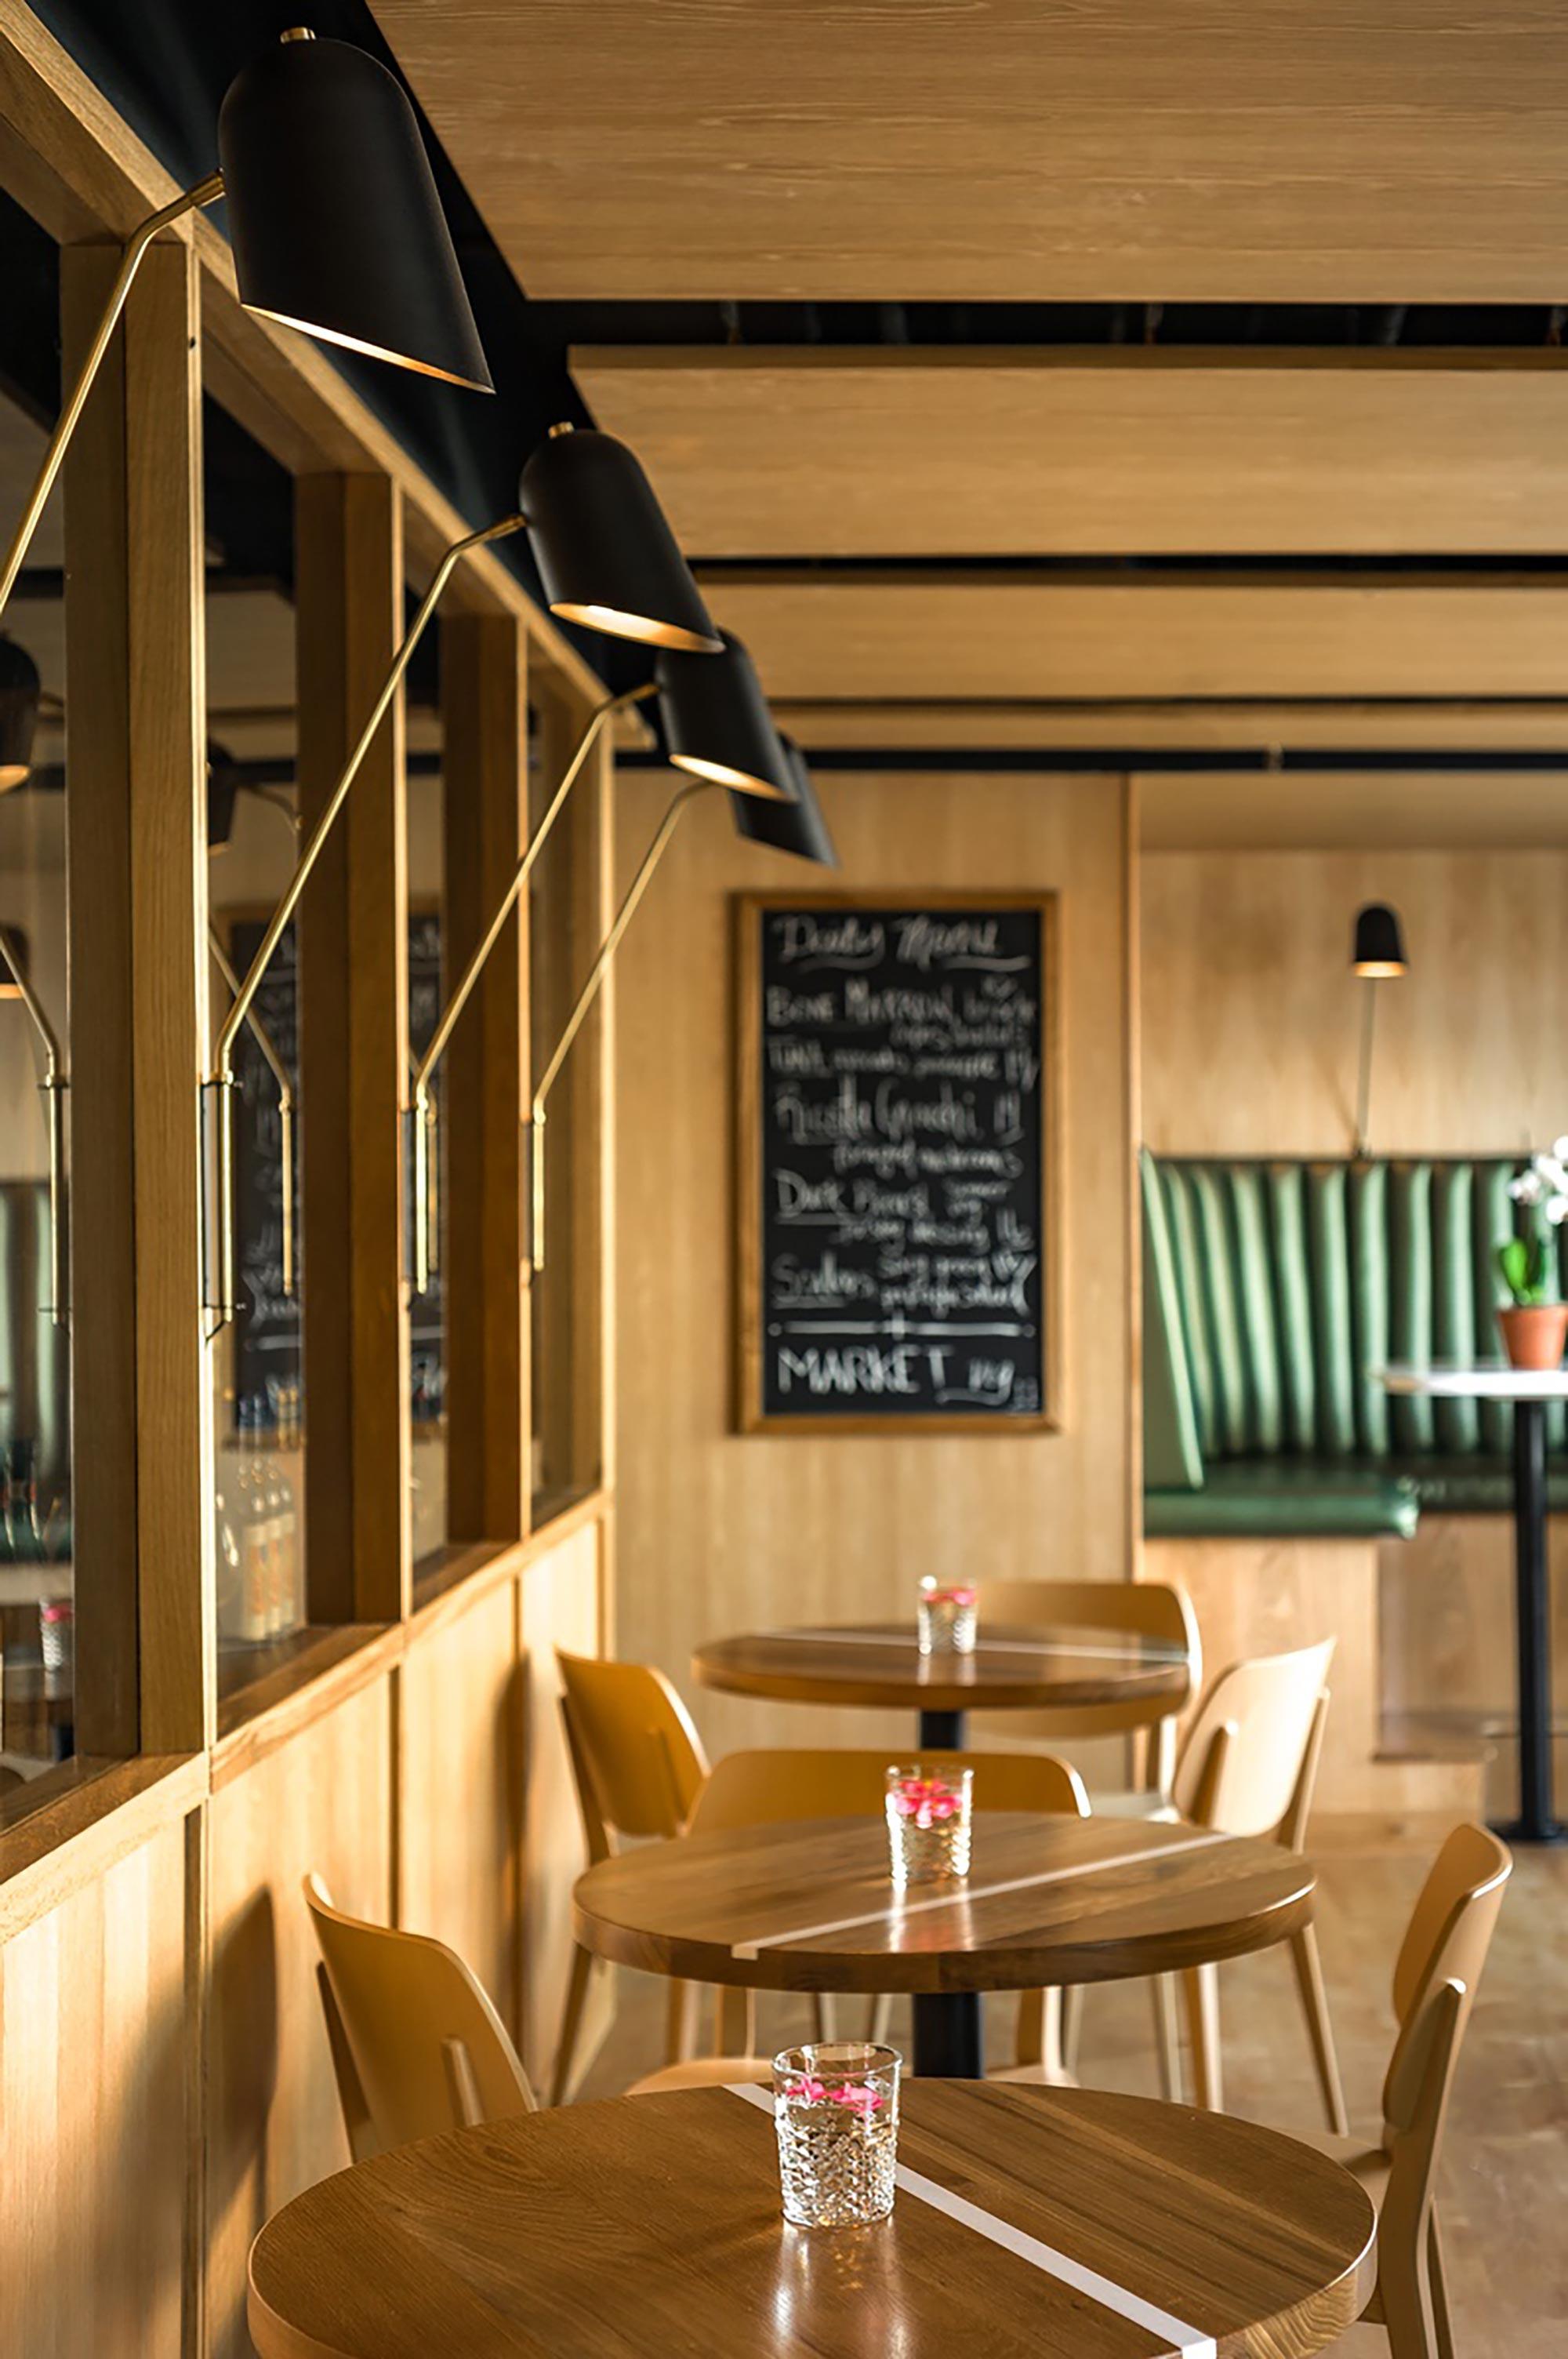 interior-design-halifax-restaurant-tables-flowers.jpg